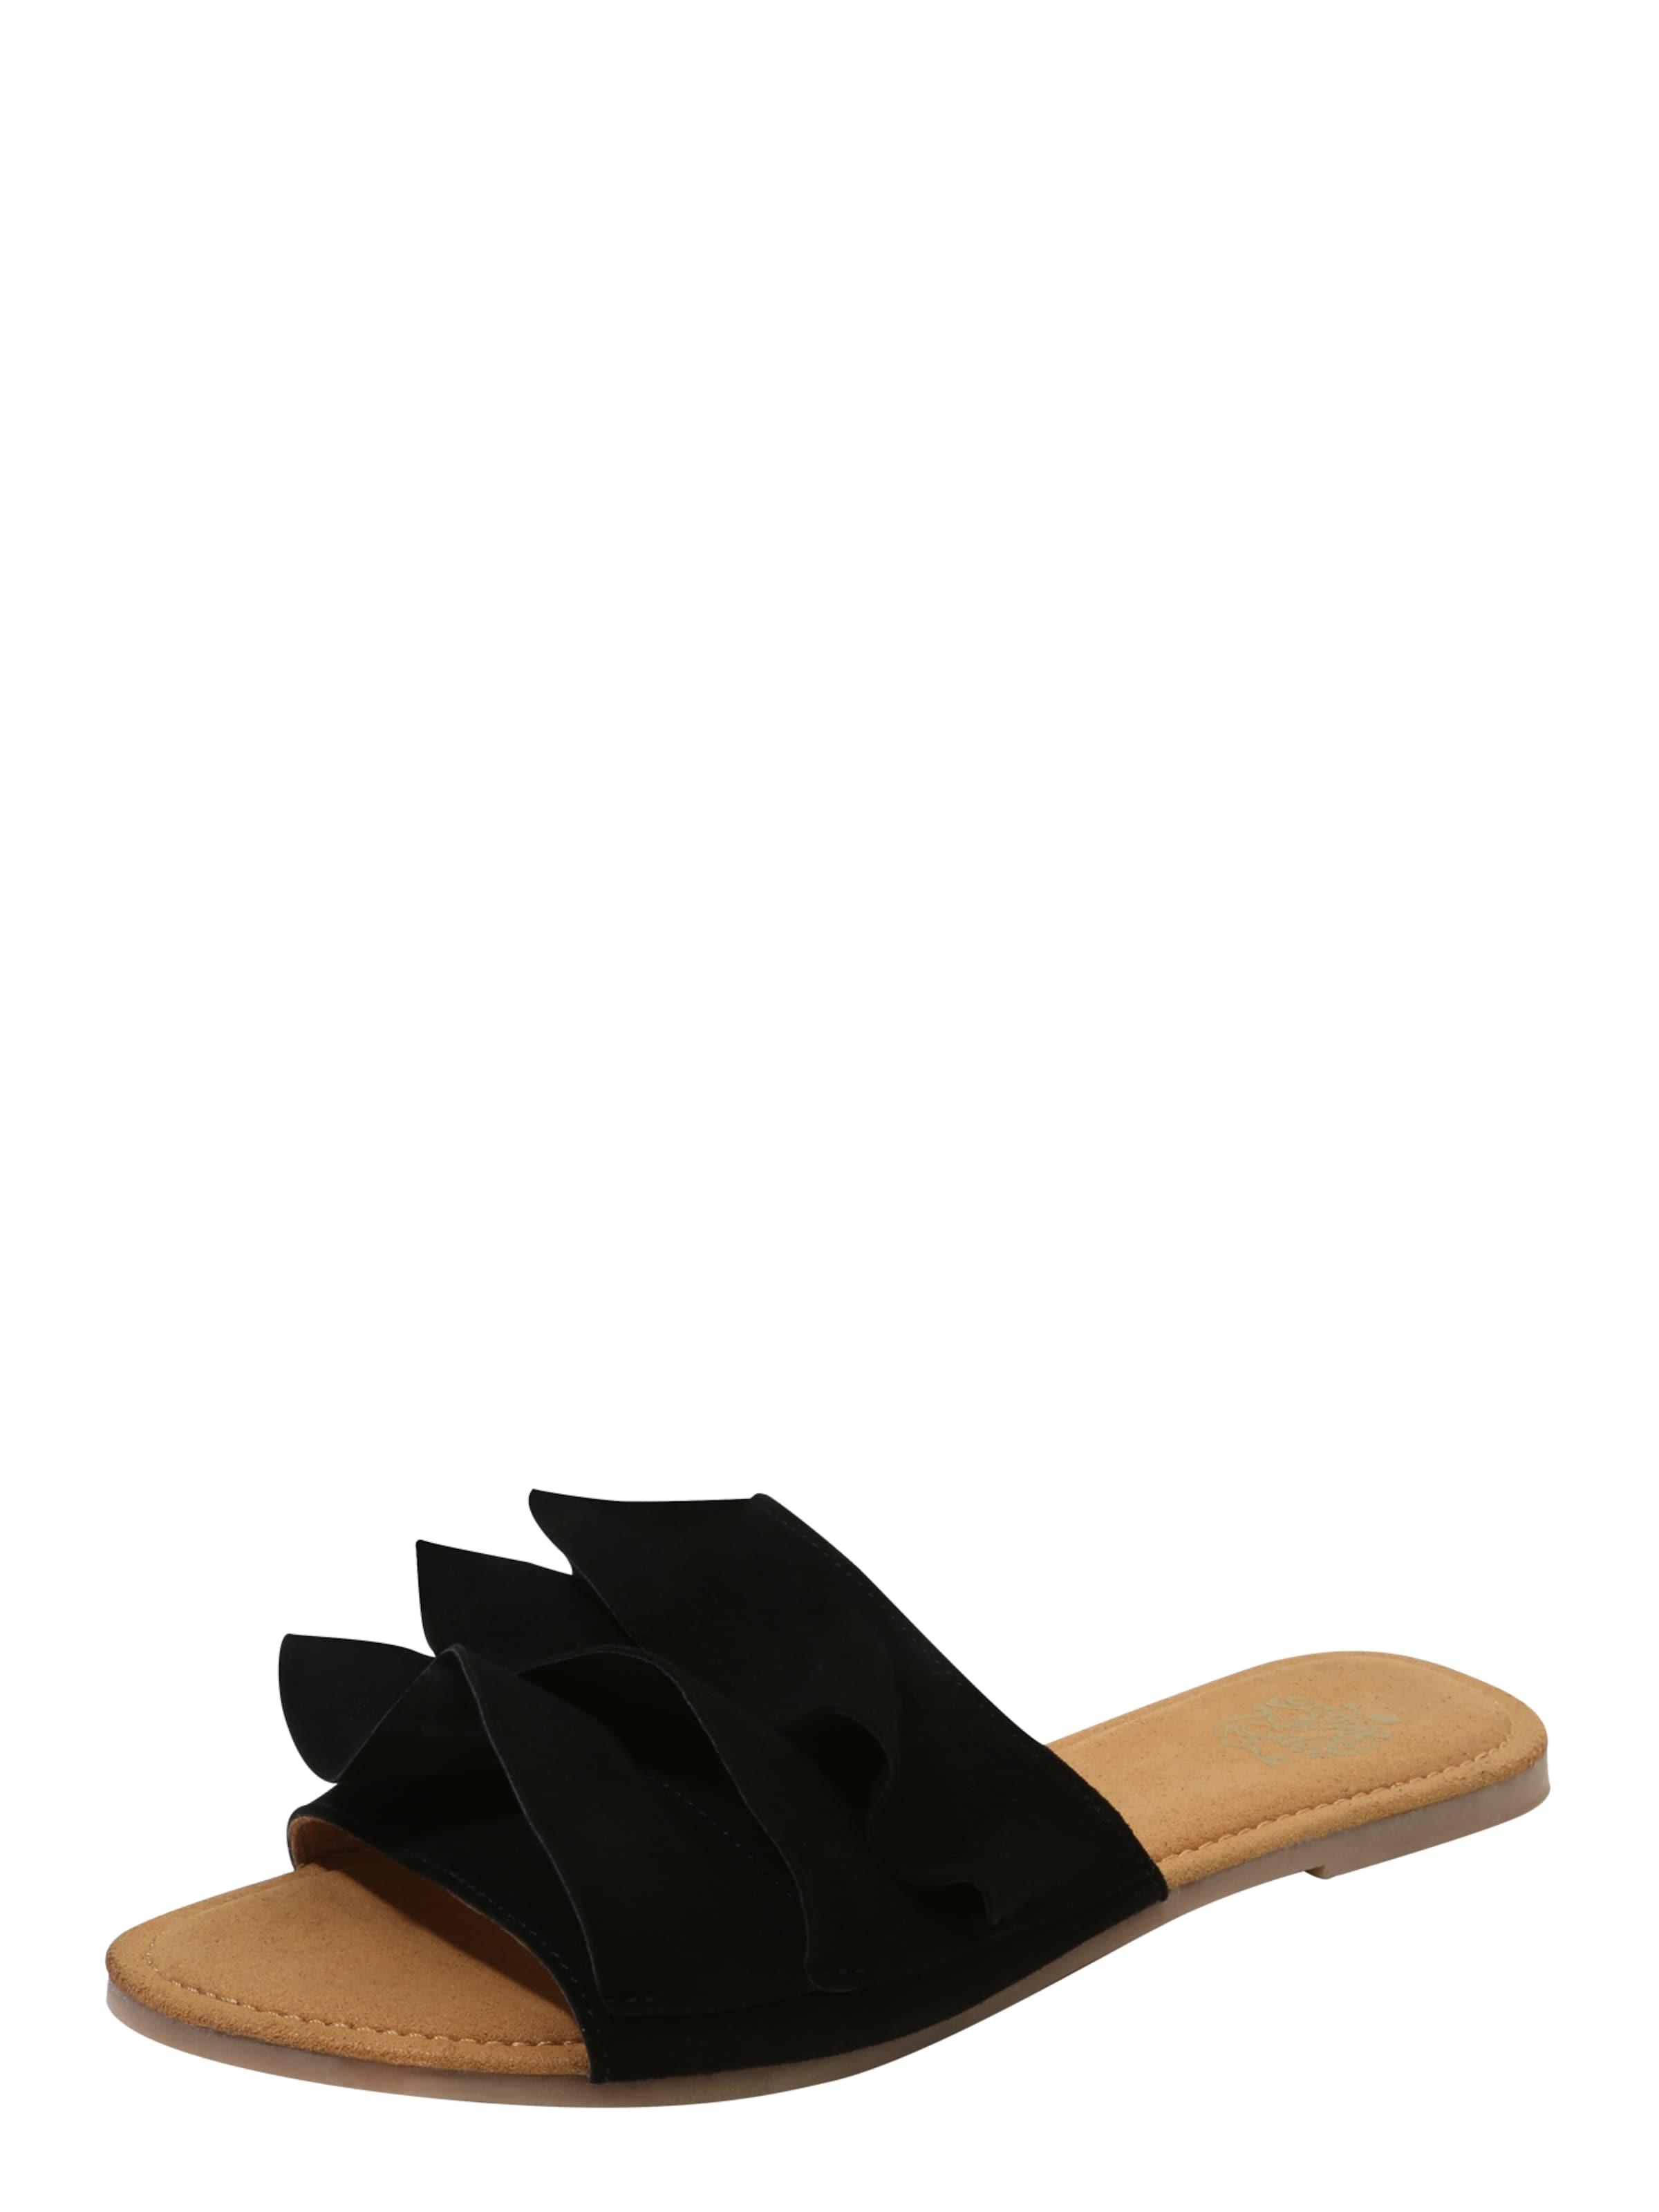 Apple Schuhe of Eden | Pantolette 'Shelby' Schuhe Gut getragene Schuhe Apple 65c0c6